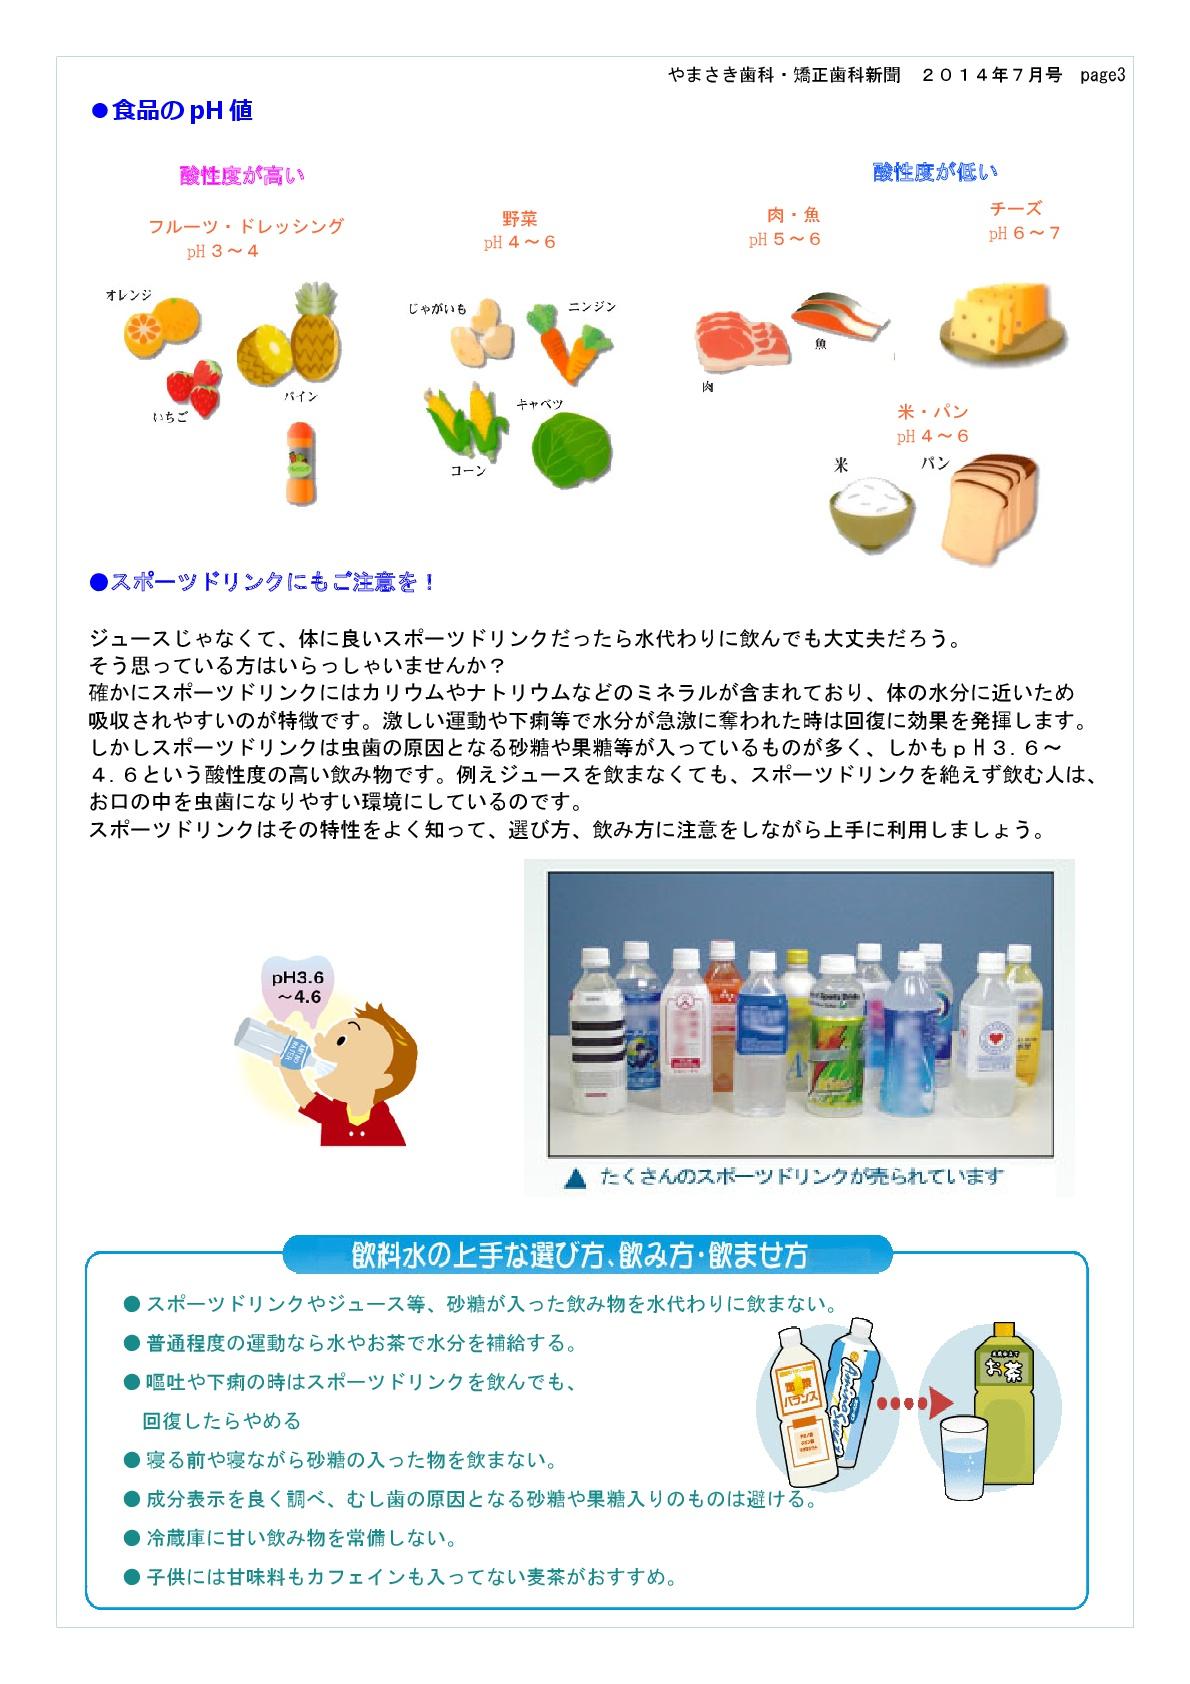 sinbun14-7-2-002